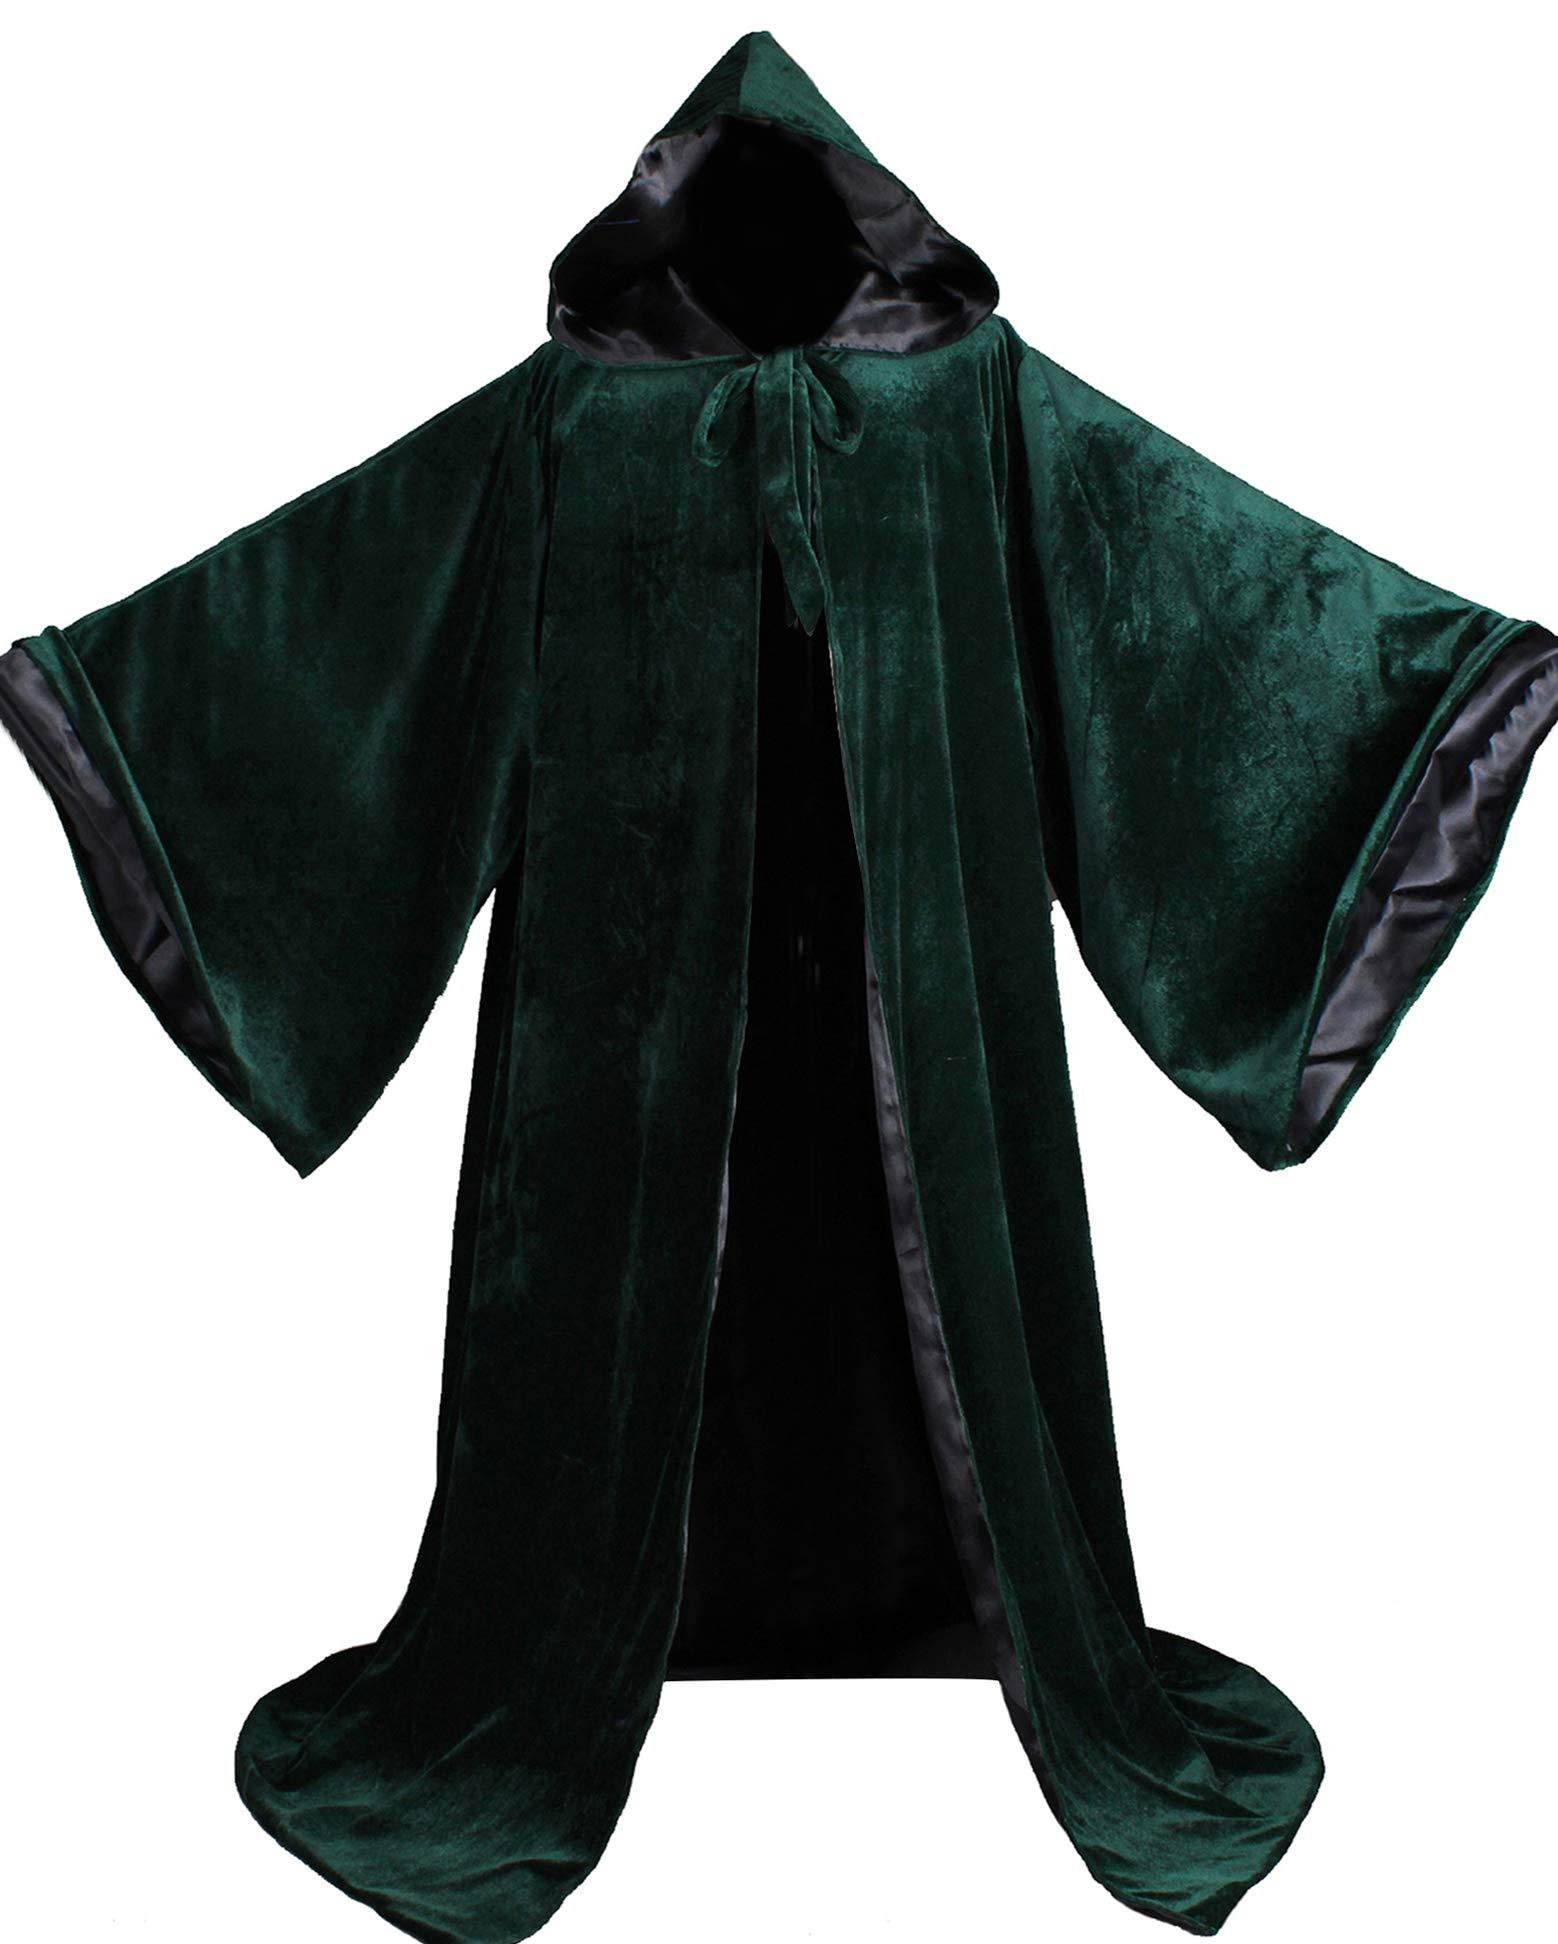 LuckyMjmy Velvet Wizard Robe with Satin Lined Hood